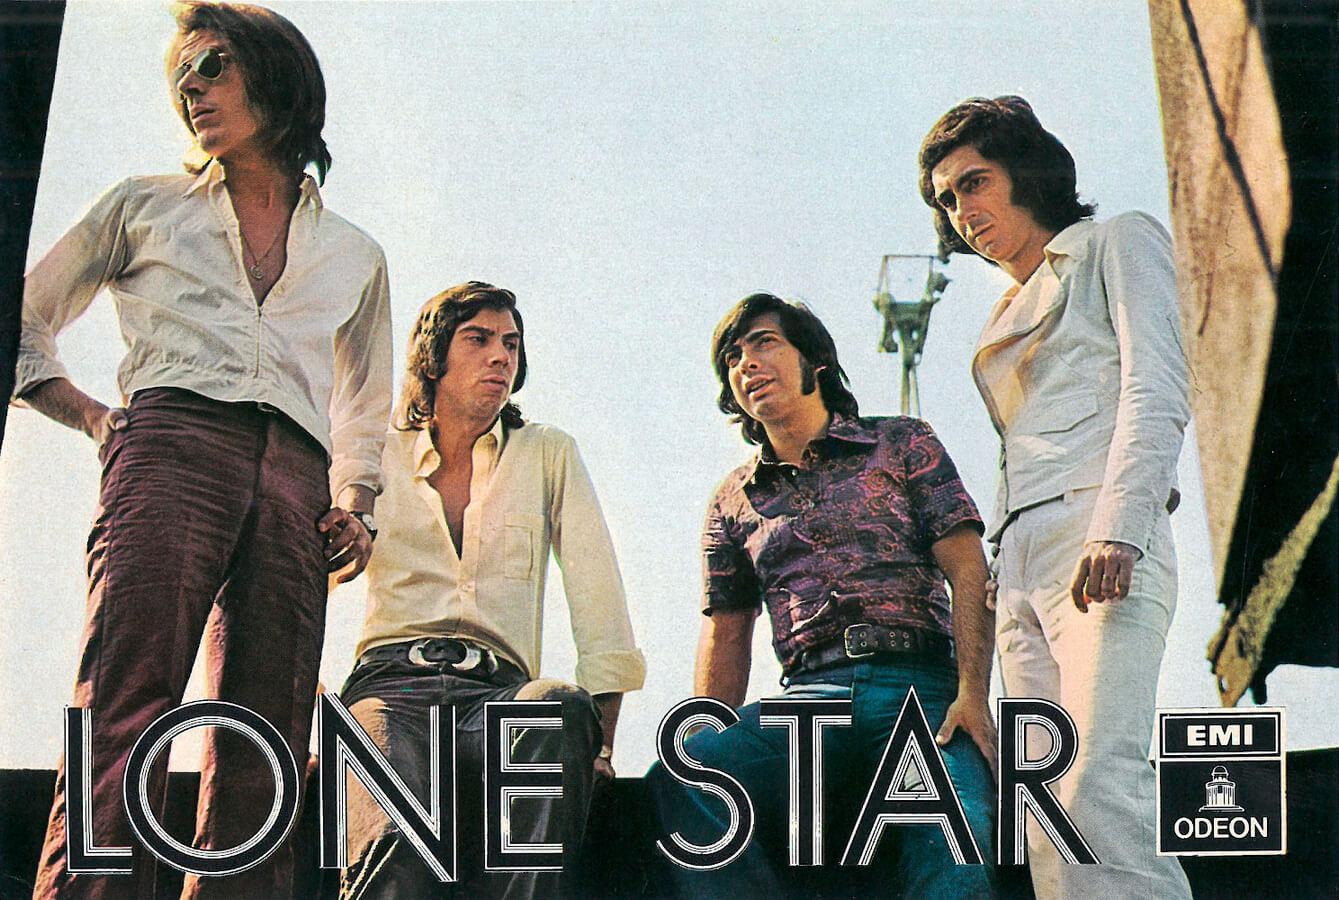 09-EMI-Odeon-Lone-Star